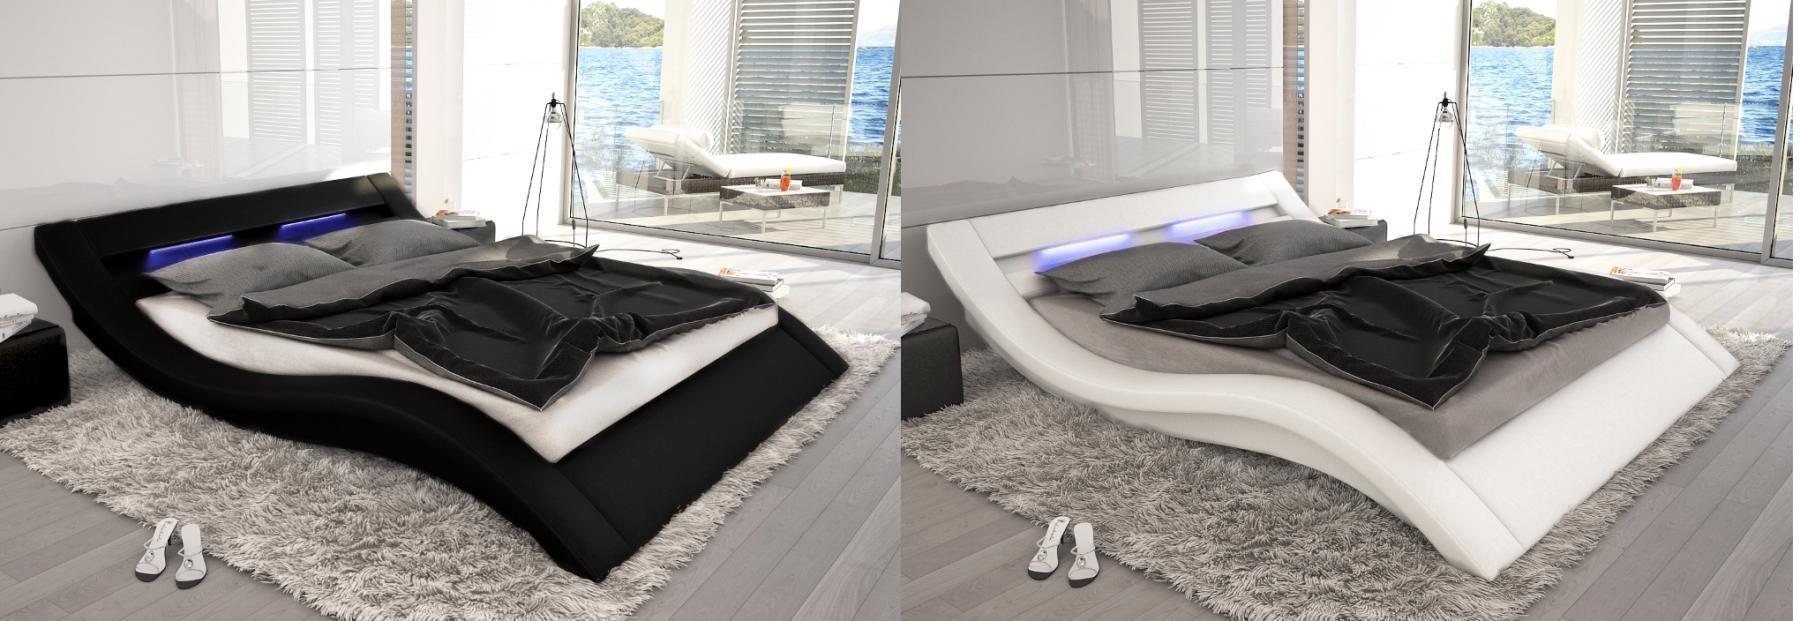 betten gnstig 140x200 bett x mit bettkasten gnstig nett. Black Bedroom Furniture Sets. Home Design Ideas